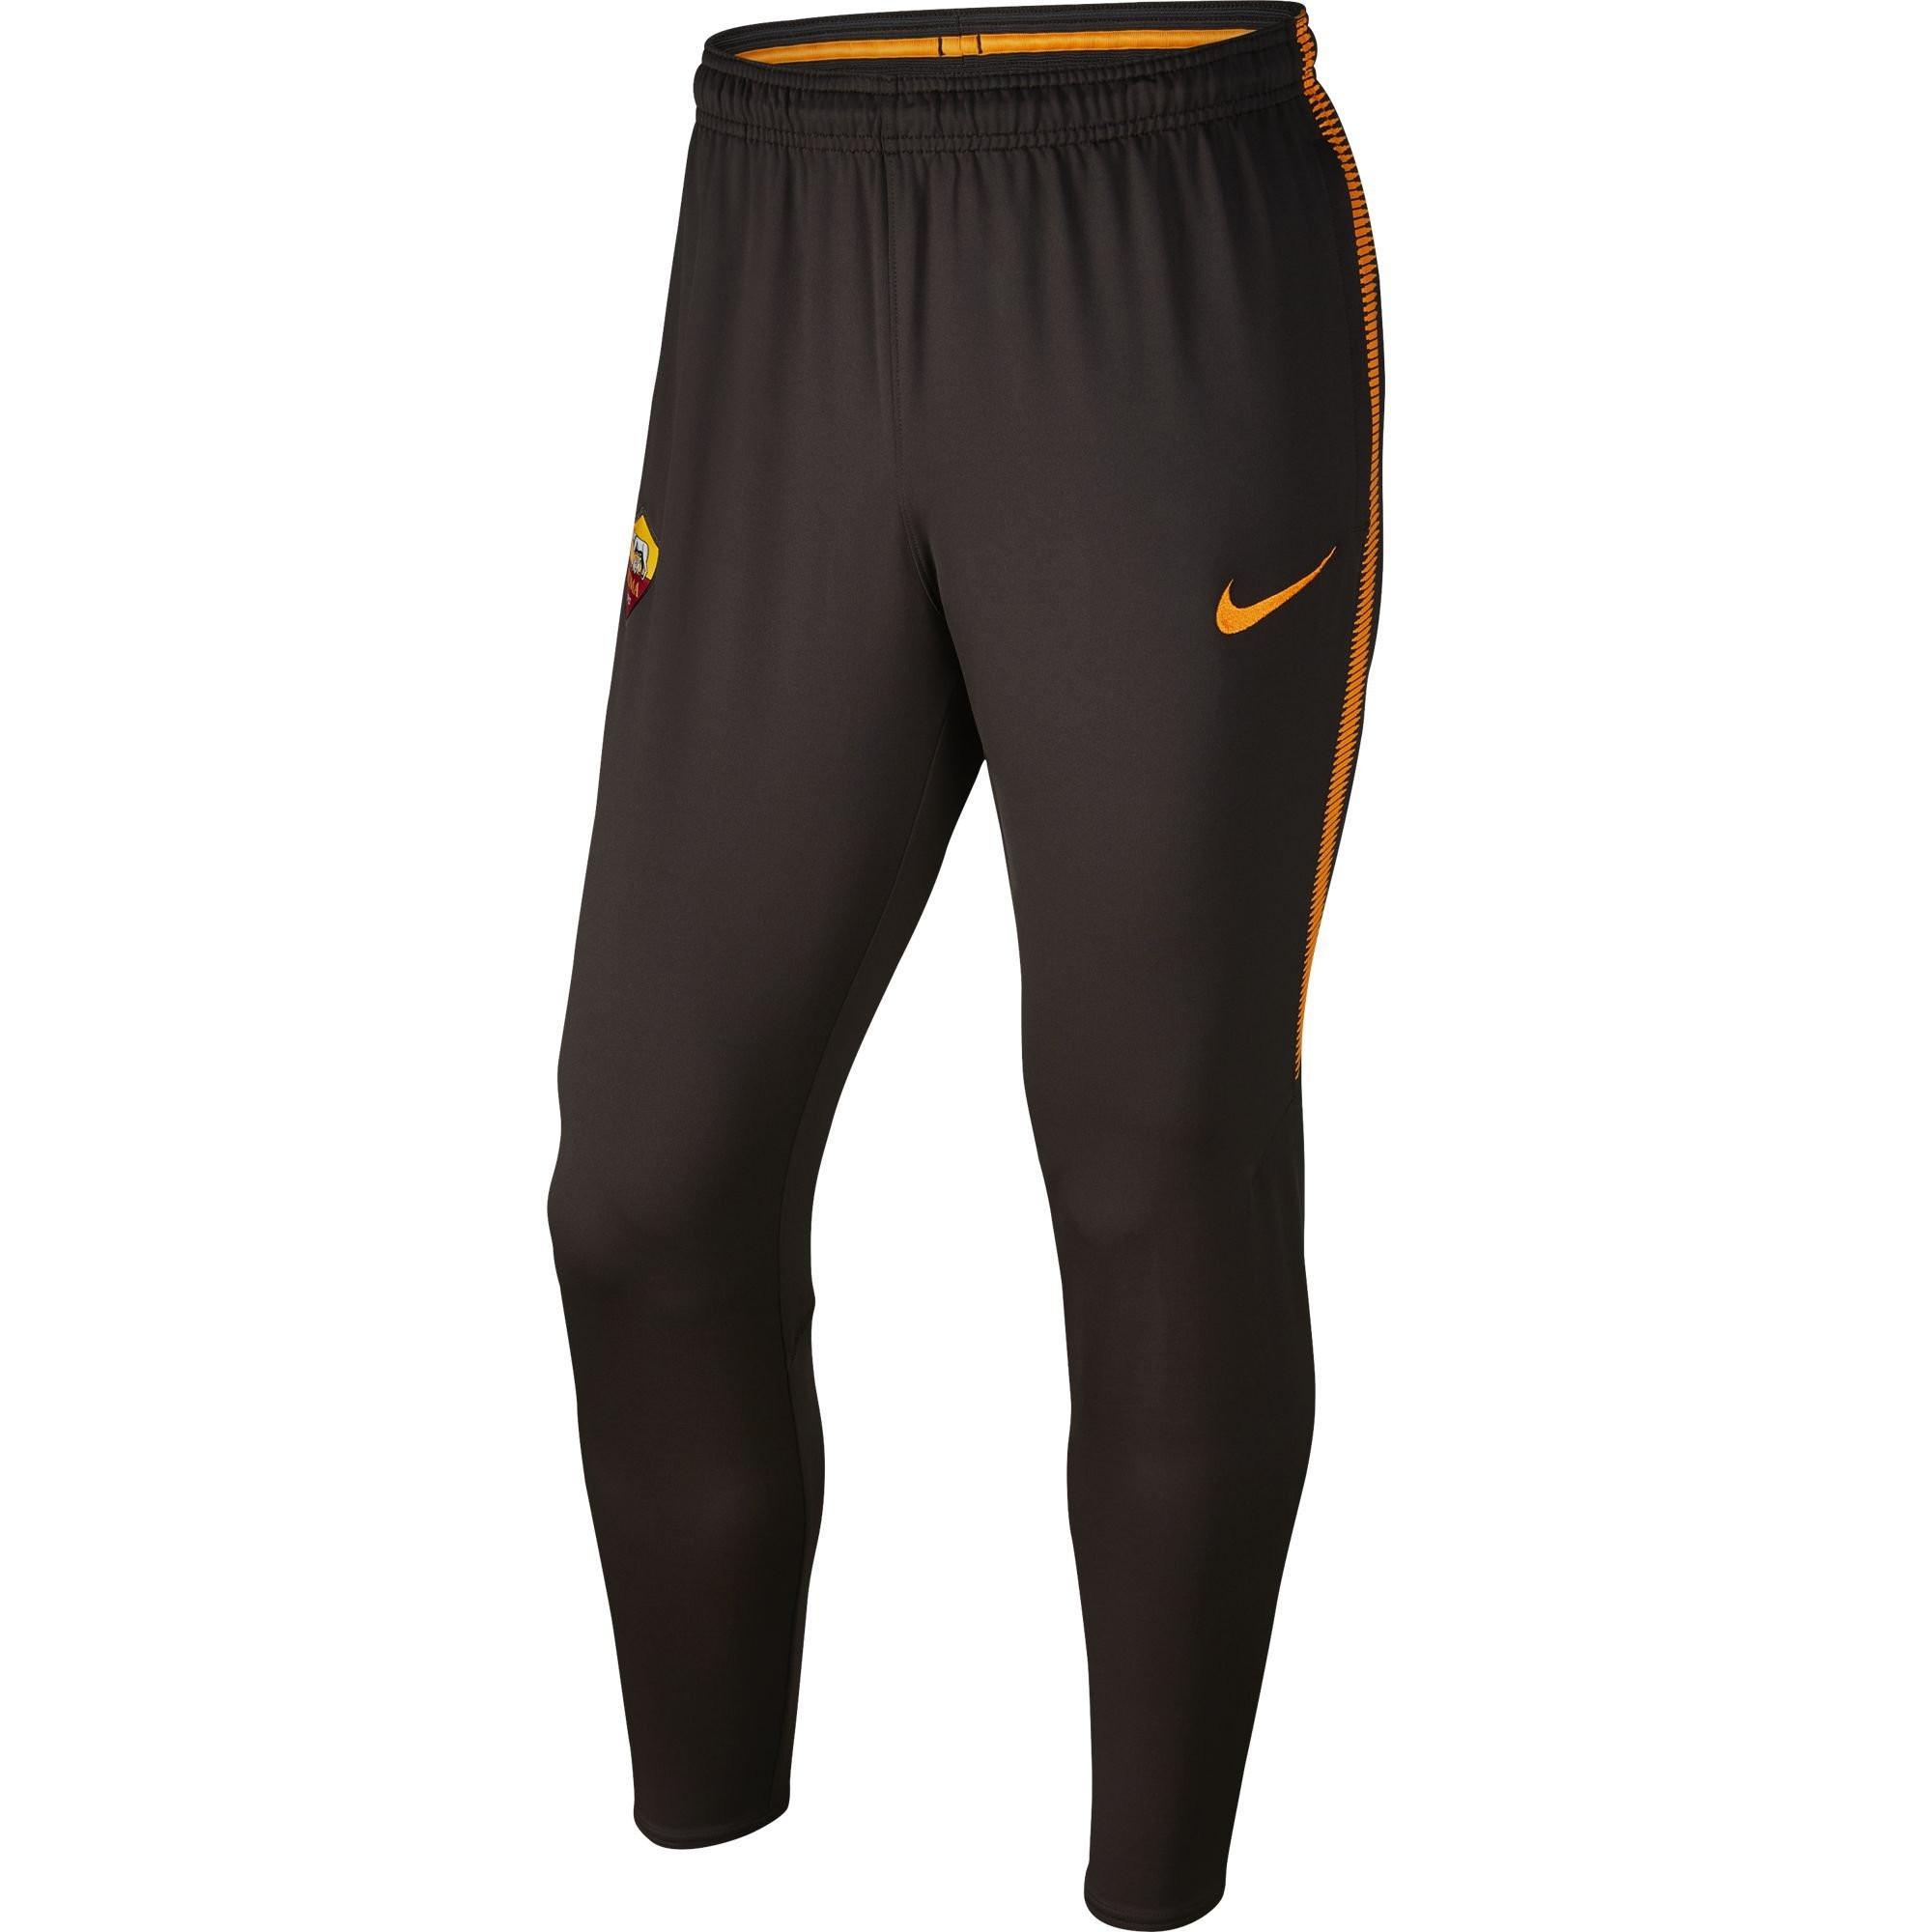 Nike as roma trg pant marron 2017 2018 as roma club for Univers du jardin maule 78